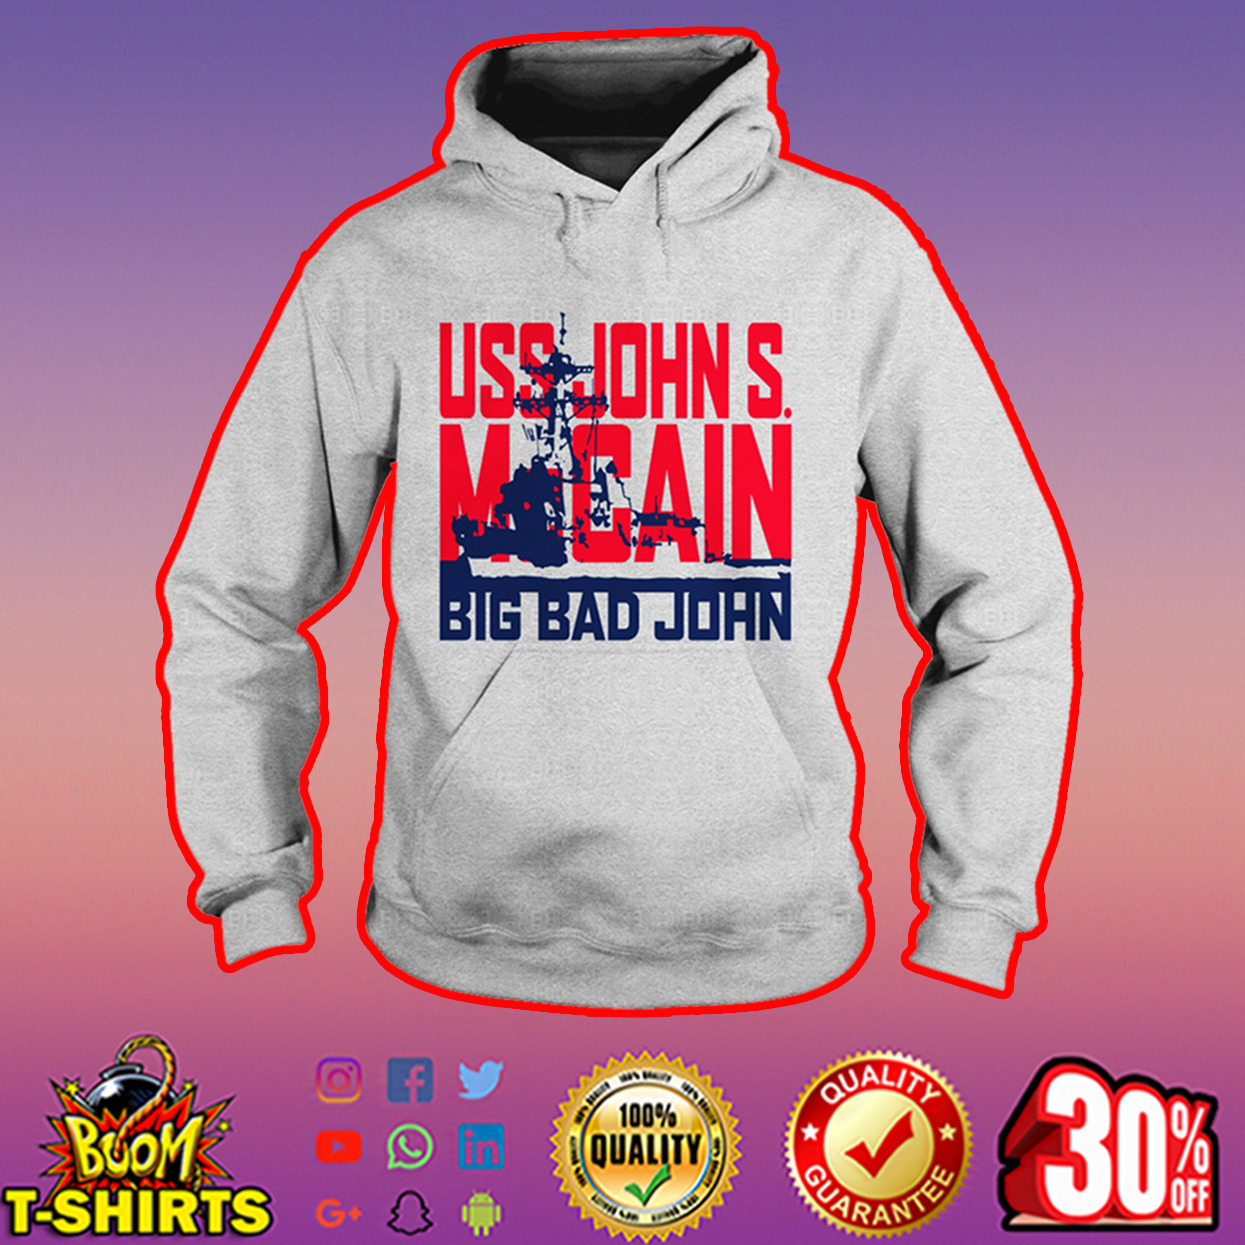 USS John S. McCain Big Bad John hoodie